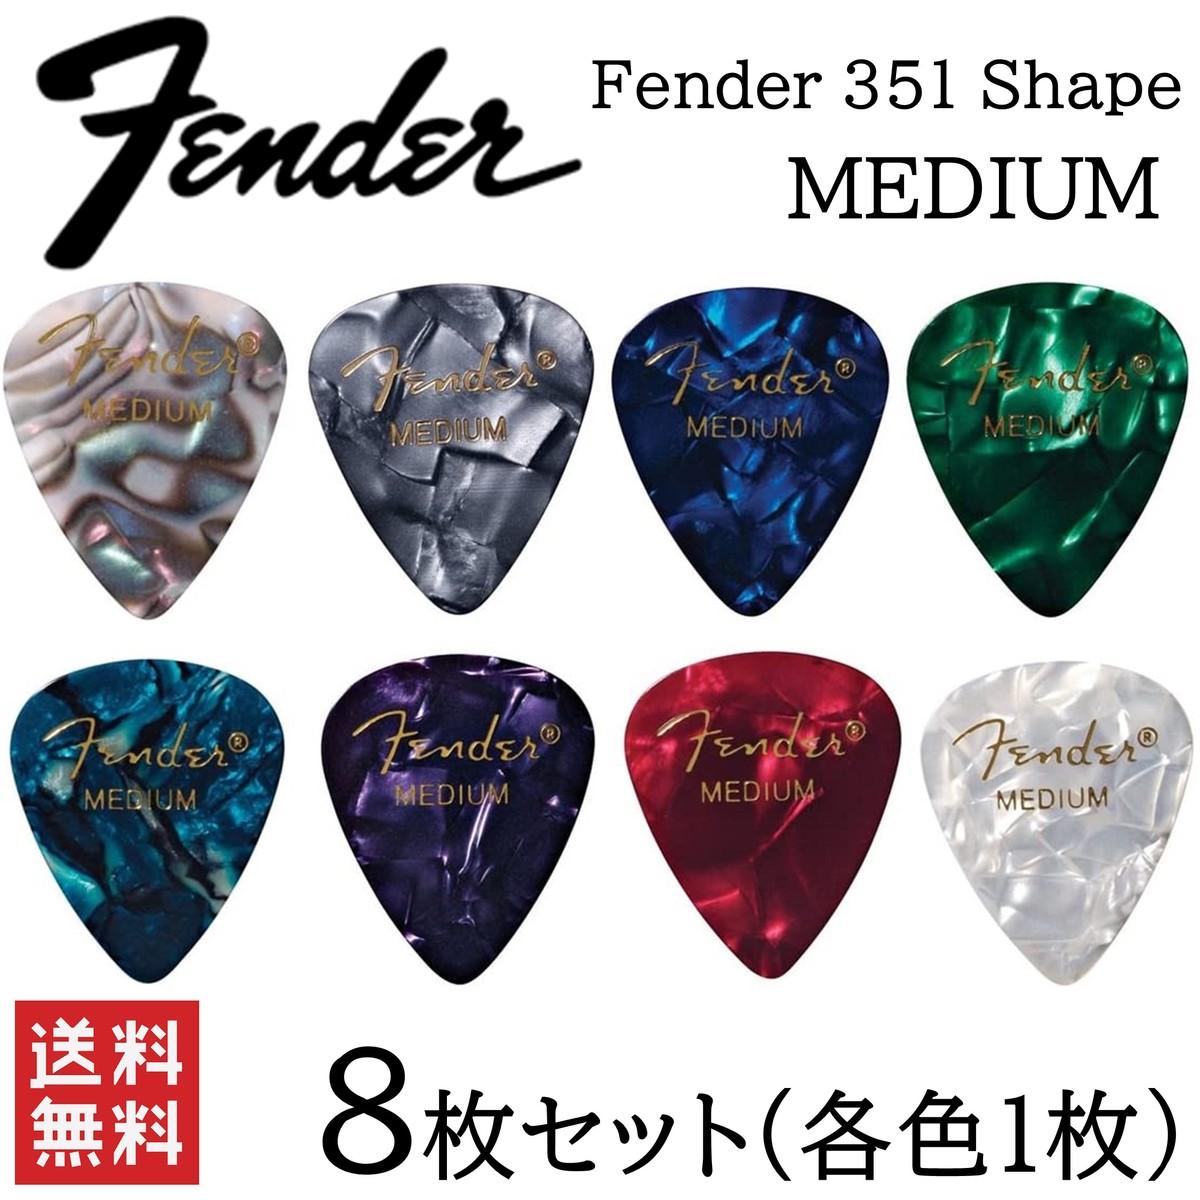 Fenderピック MEDIUM 8枚 各色1枚 Fender 返品送料無料 購買 351 ミディアム ギターピック 8色アソート ティアドロップ Shape